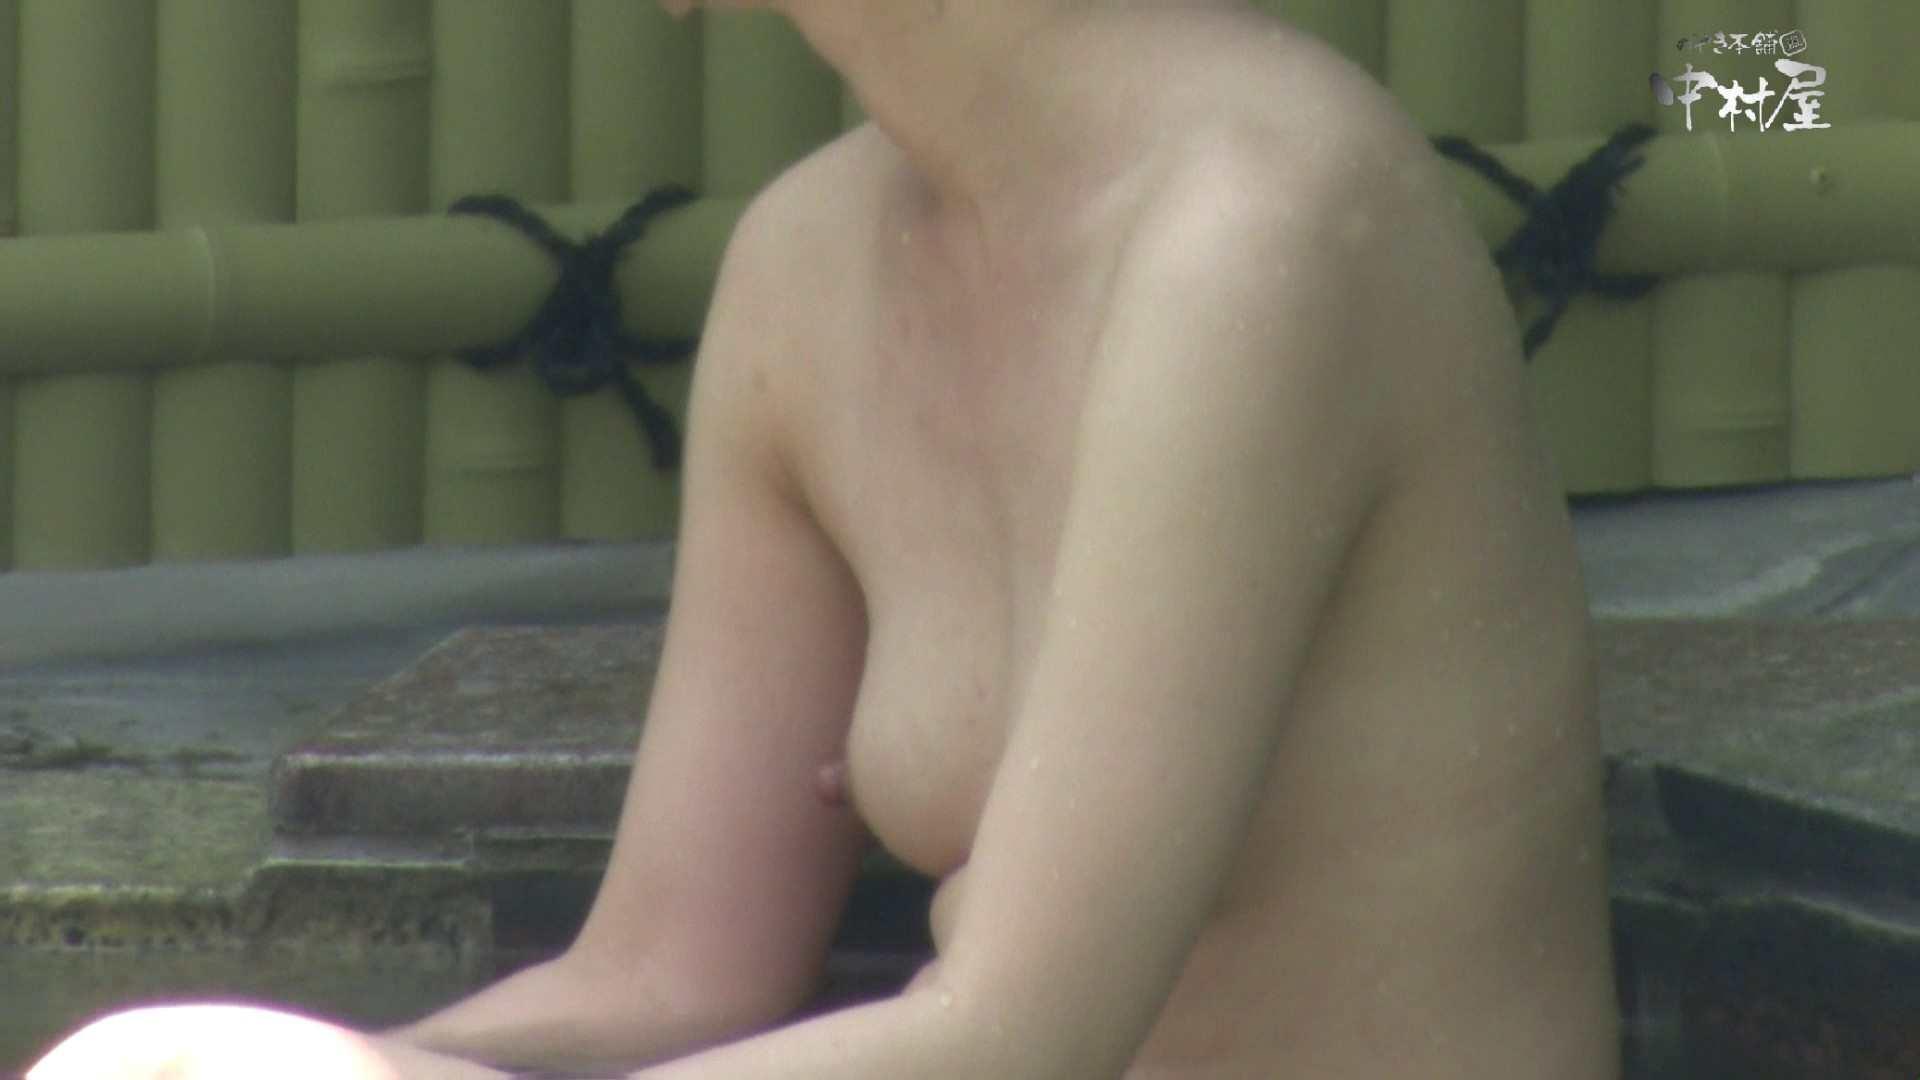 Aquaな露天風呂Vol.888 OLセックス   露天  77画像 16